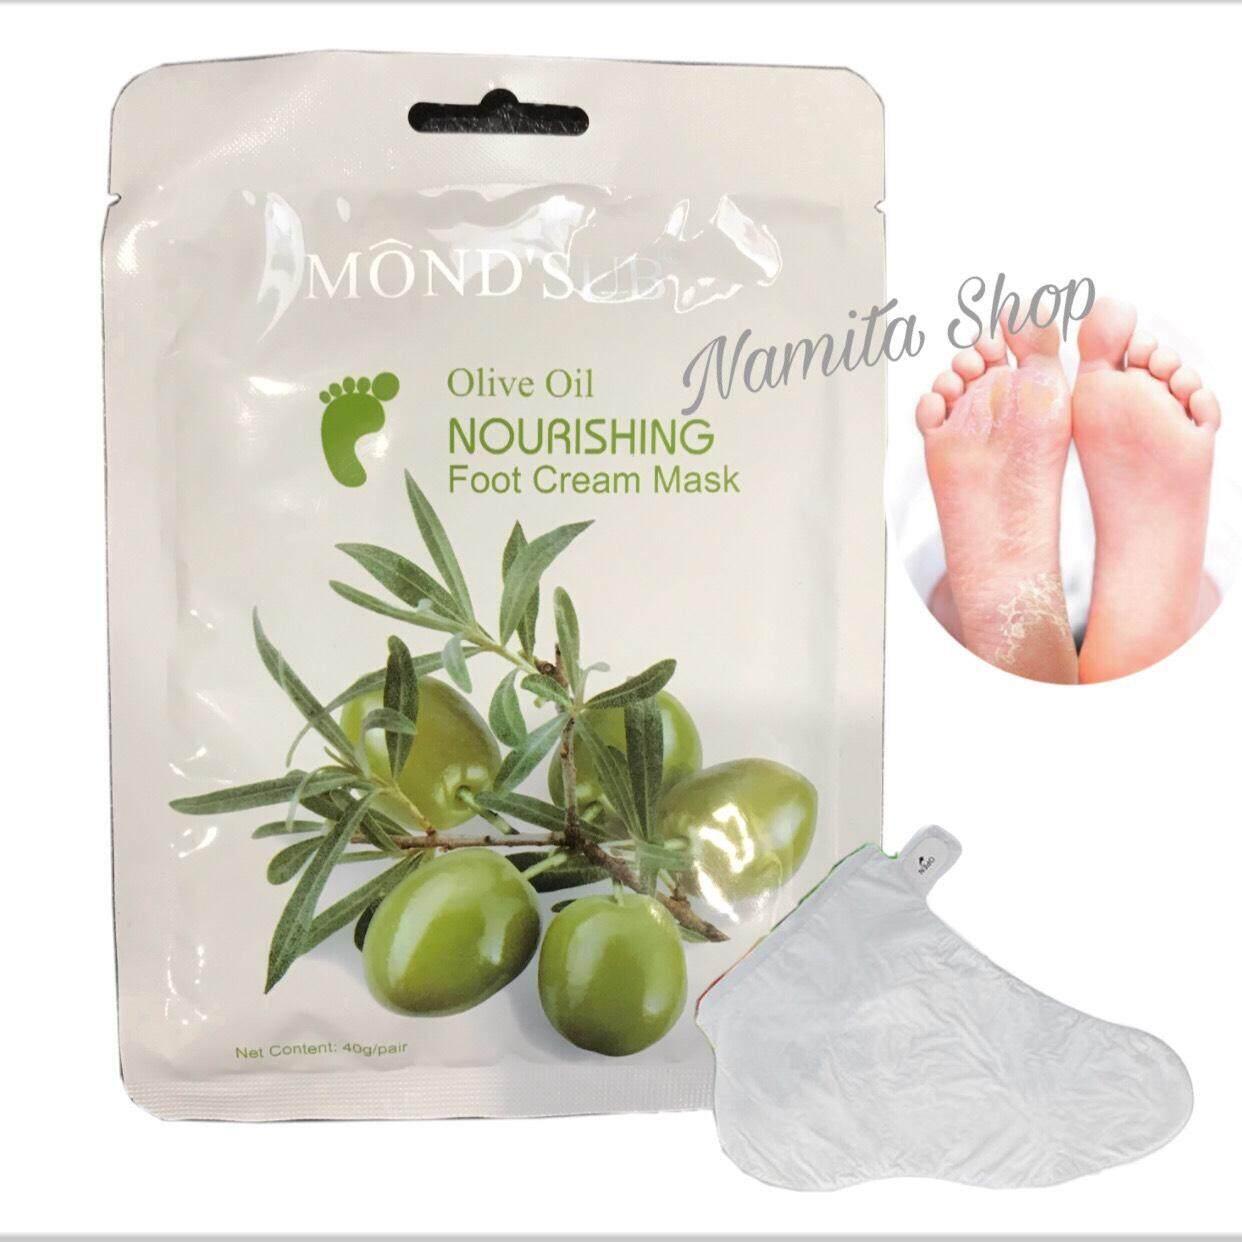 Mondsub Olive Oil Nourishing Foot Cream Mask มาร์กเท้า ปรับเท้านุ่ม ชุ่มชื่นสูตรธรรมชาติ By Namita Shop.